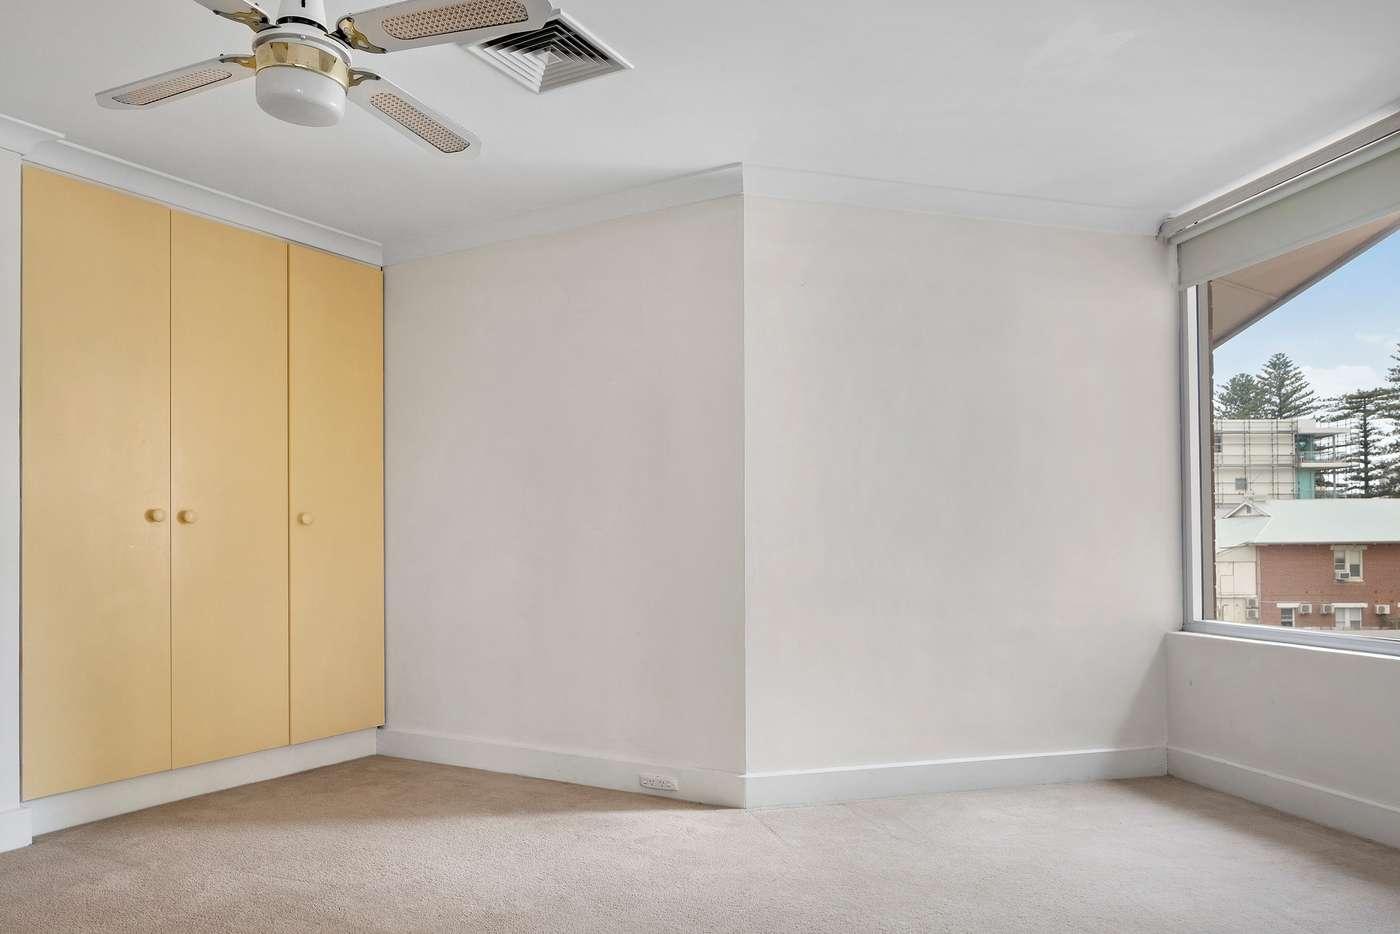 Sixth view of Homely apartment listing, 4/42 Durham Street, Glenelg SA 5045